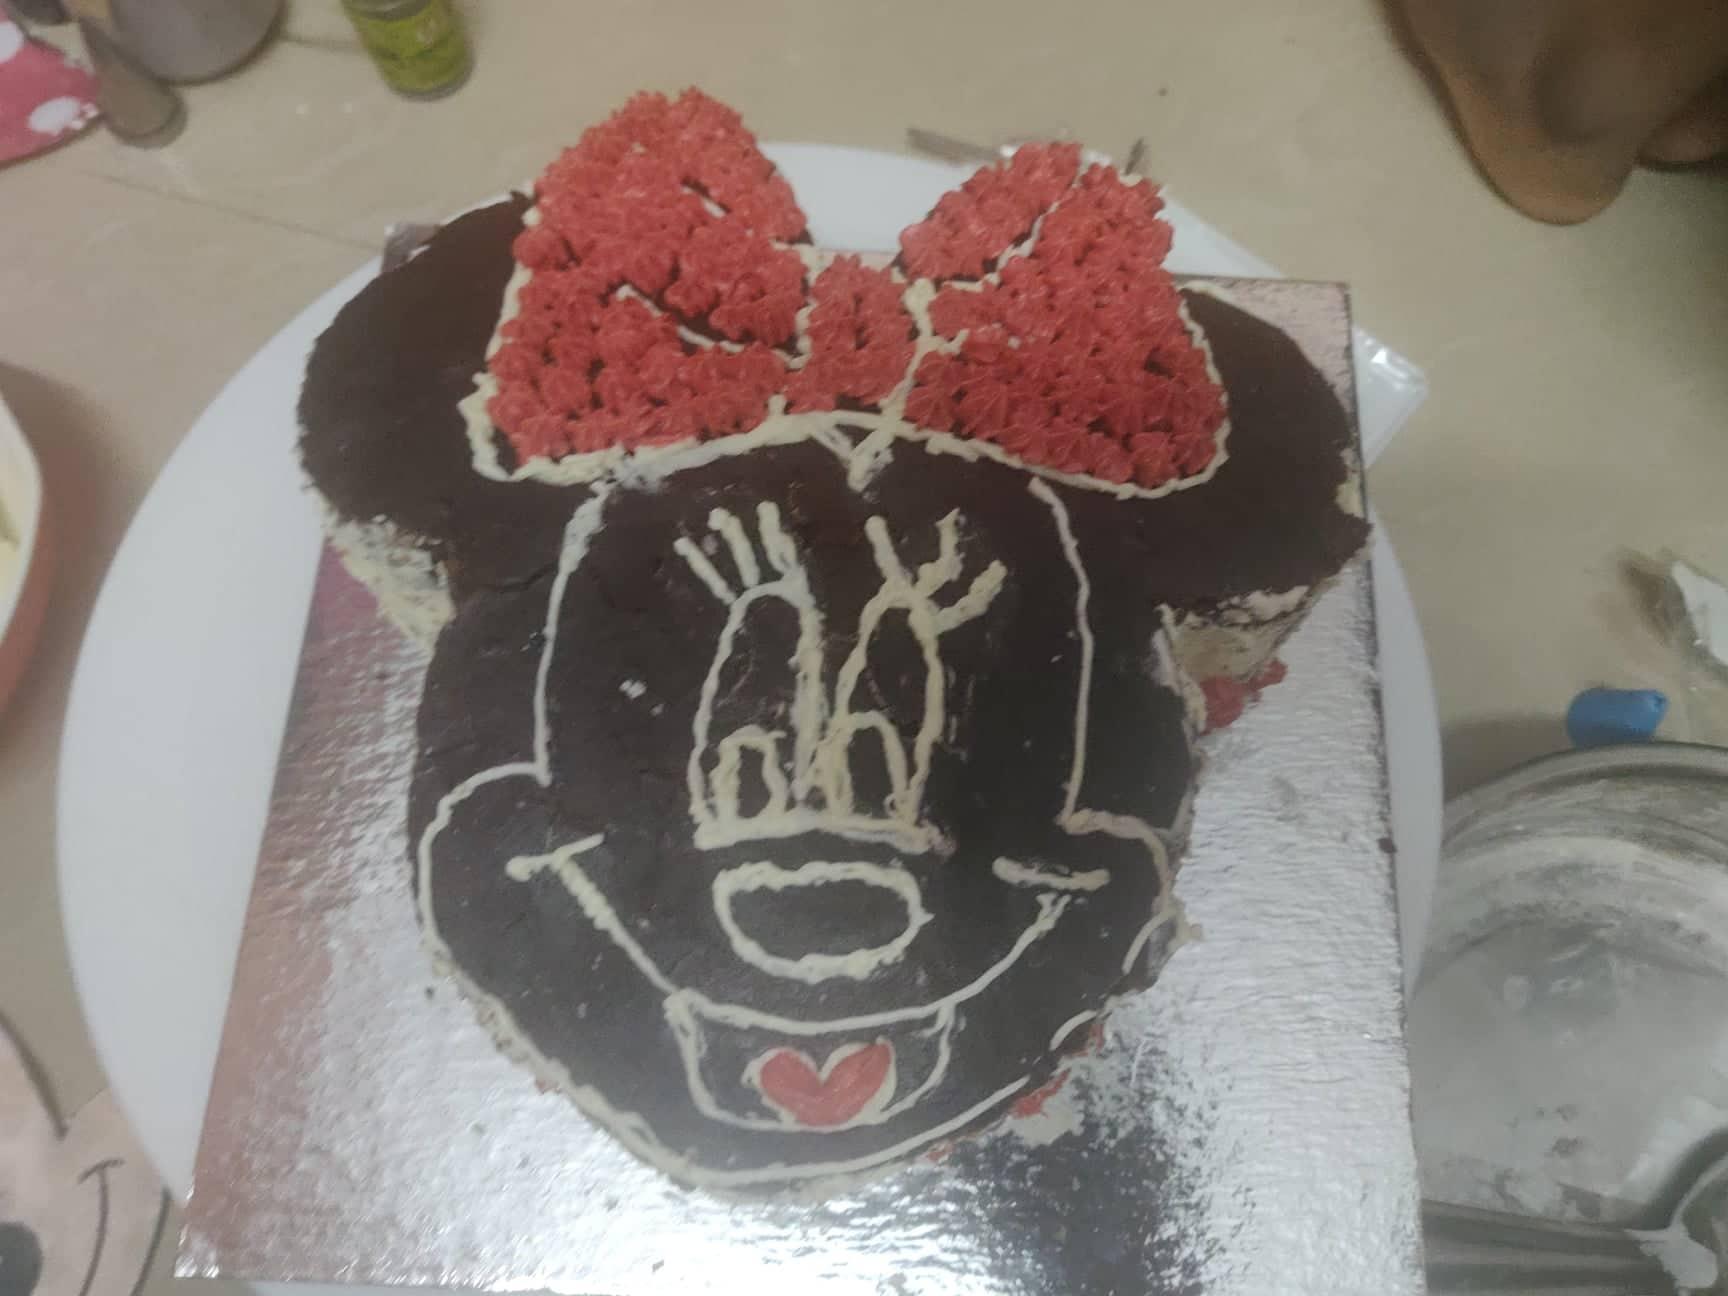 Minnie_Mouse_Cake - 178429236_229482262286267_4091500001843732757_n